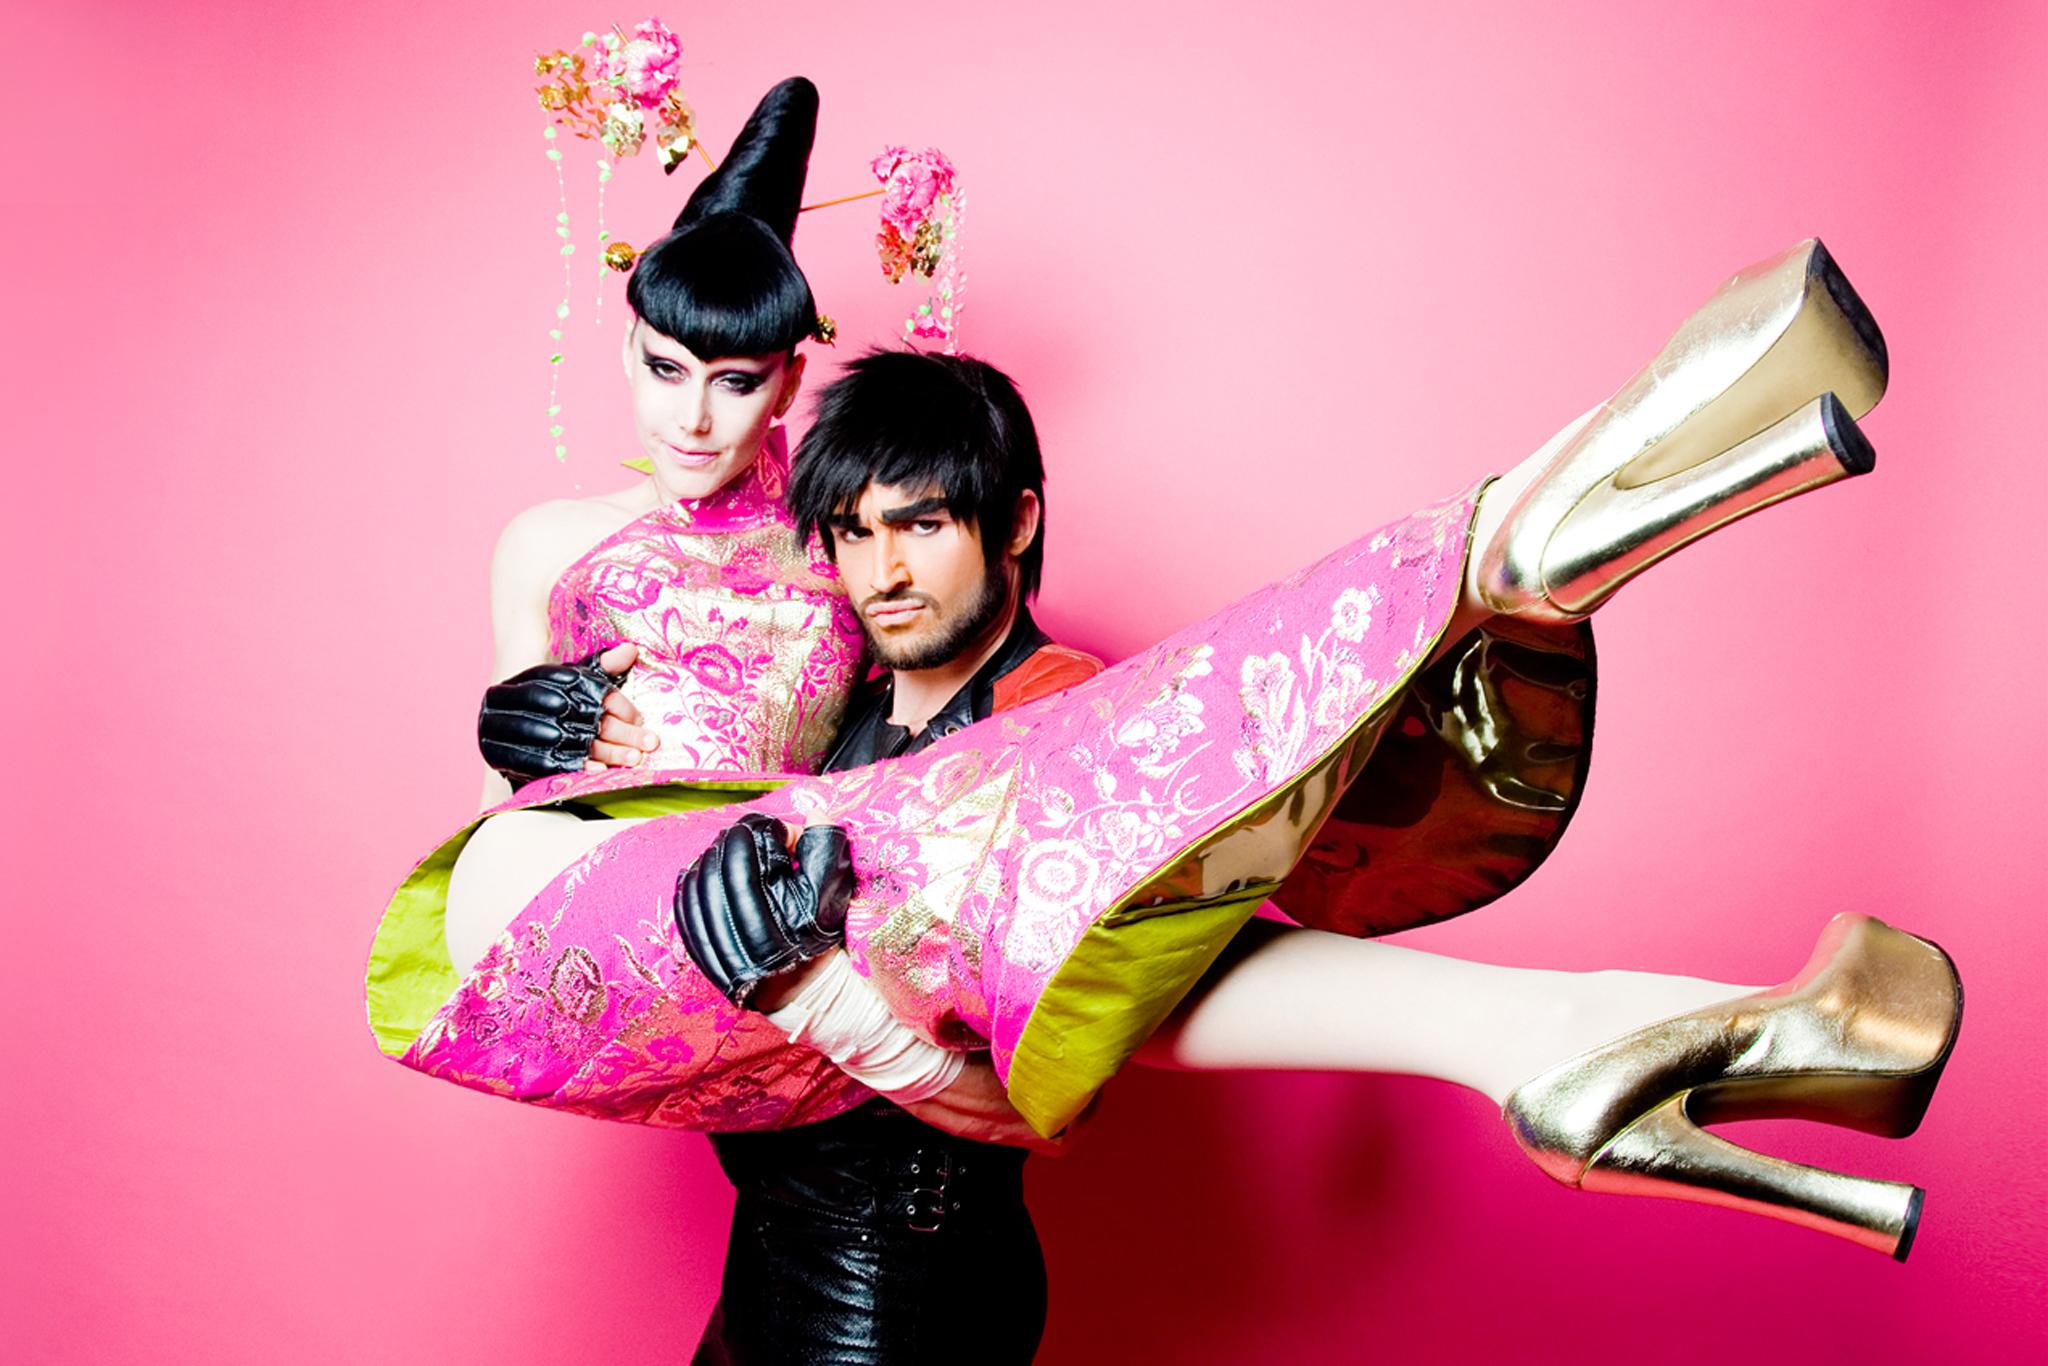 Susanne Bartsch and François Sagat in Switzerland hosting an AIDS benefit. Dress by Mathu and Zaldy, 2011.